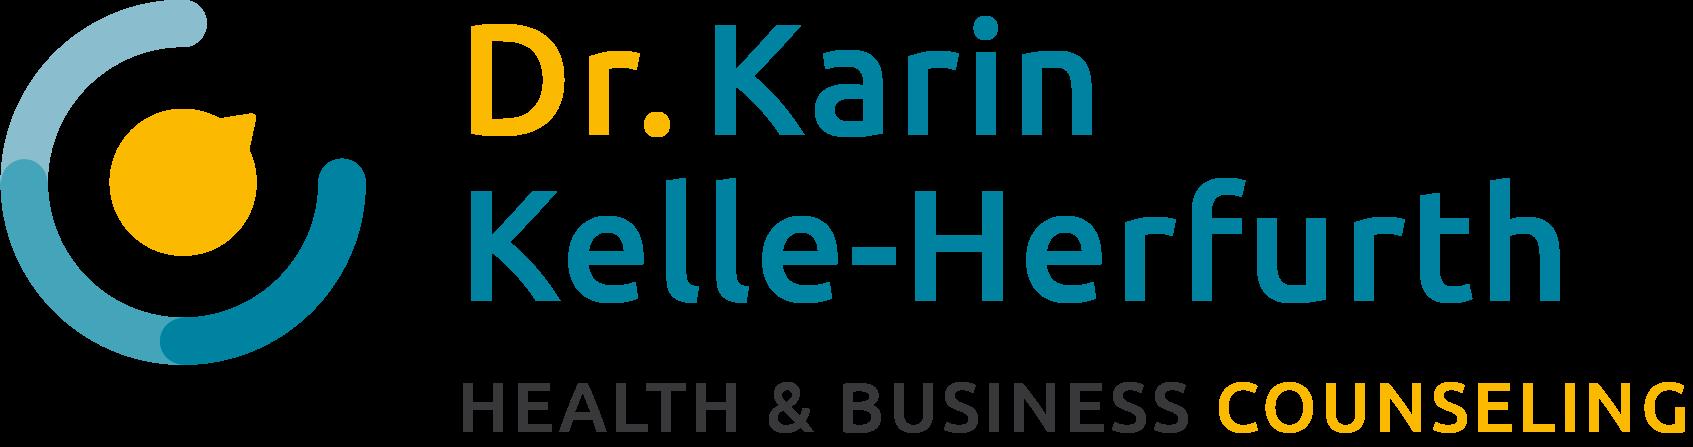 Dr. Karin Kelle-Herfurth